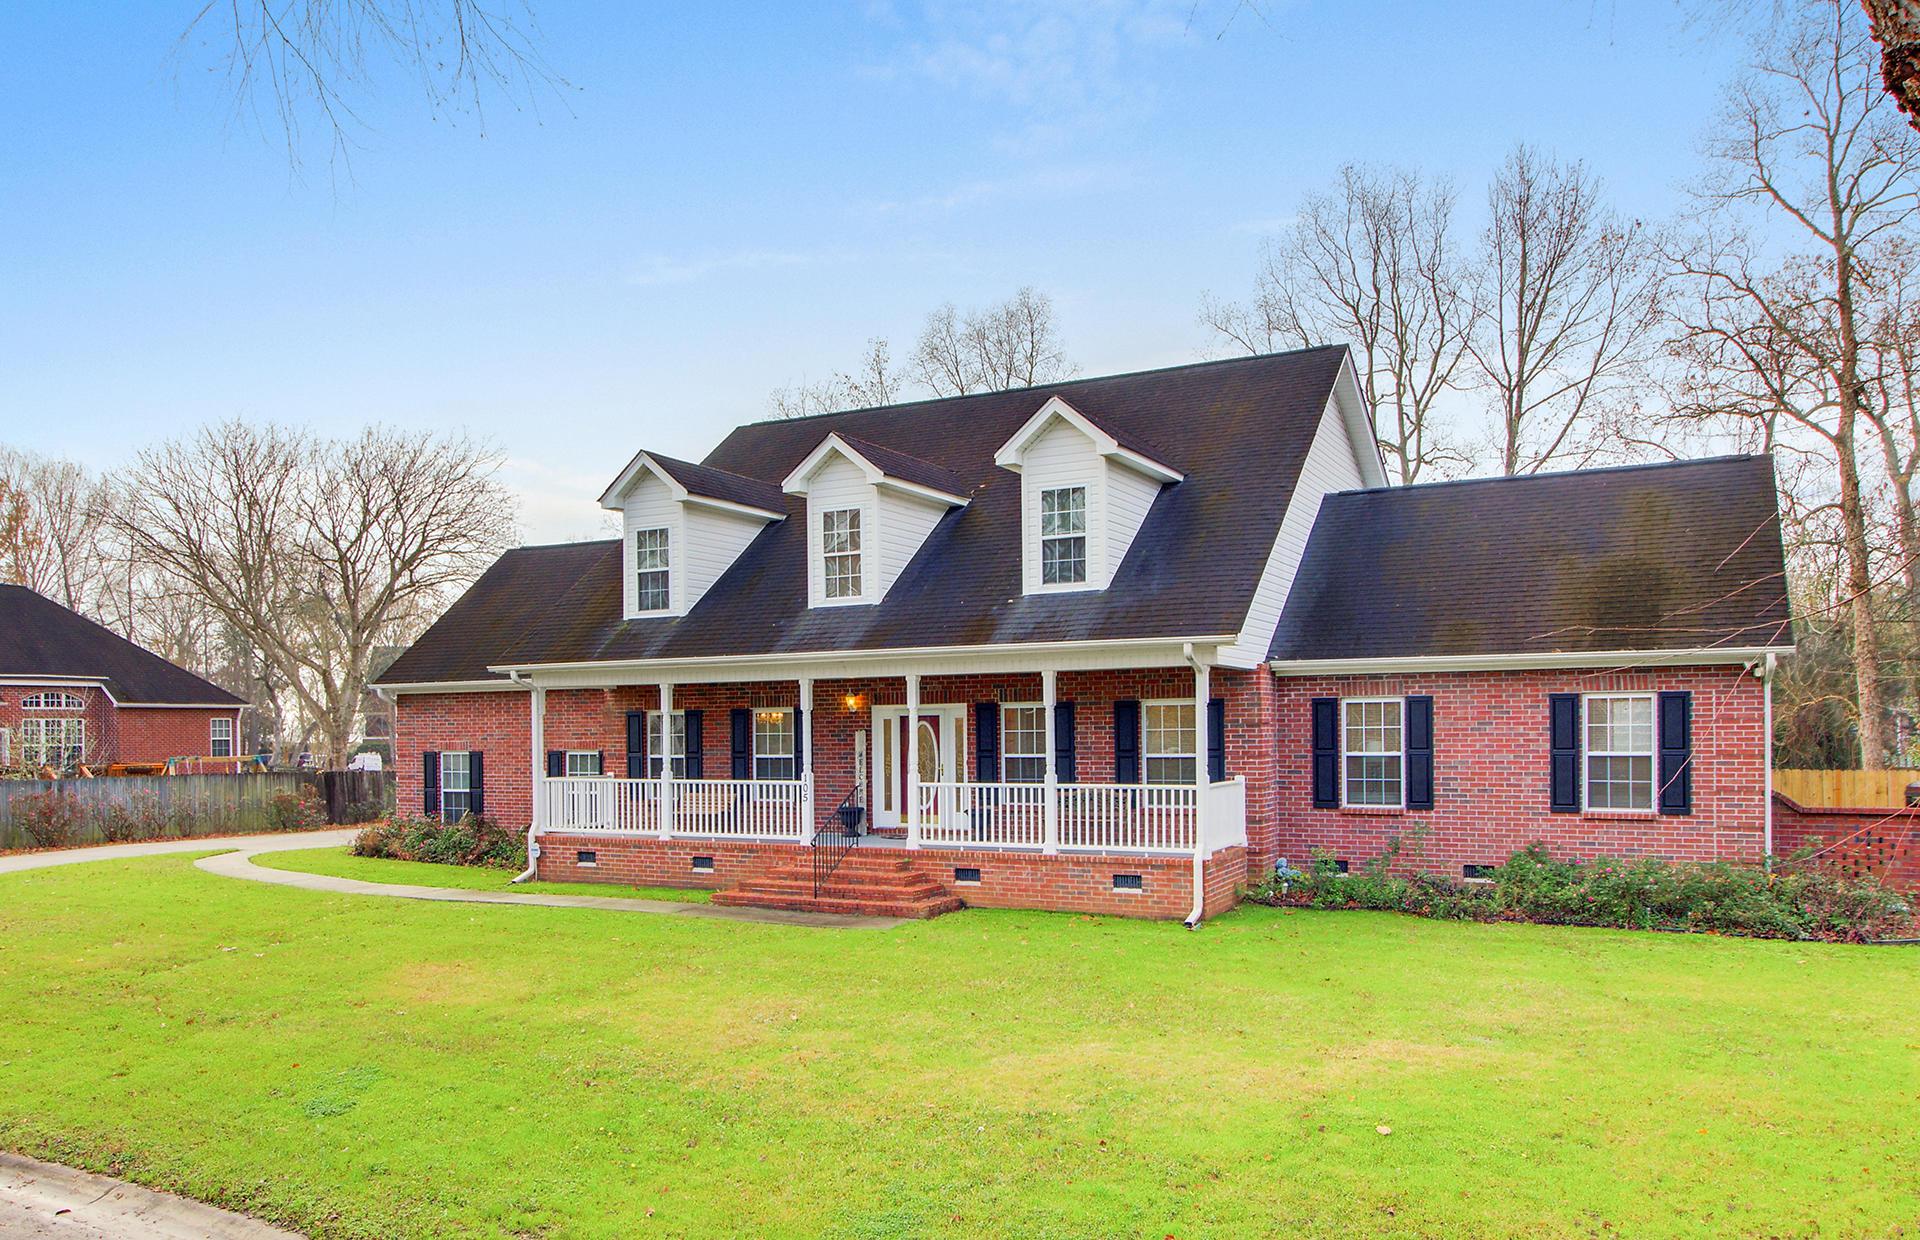 Bakers Landing Homes For Sale - 105 River Oak, North Charleston, SC - 36